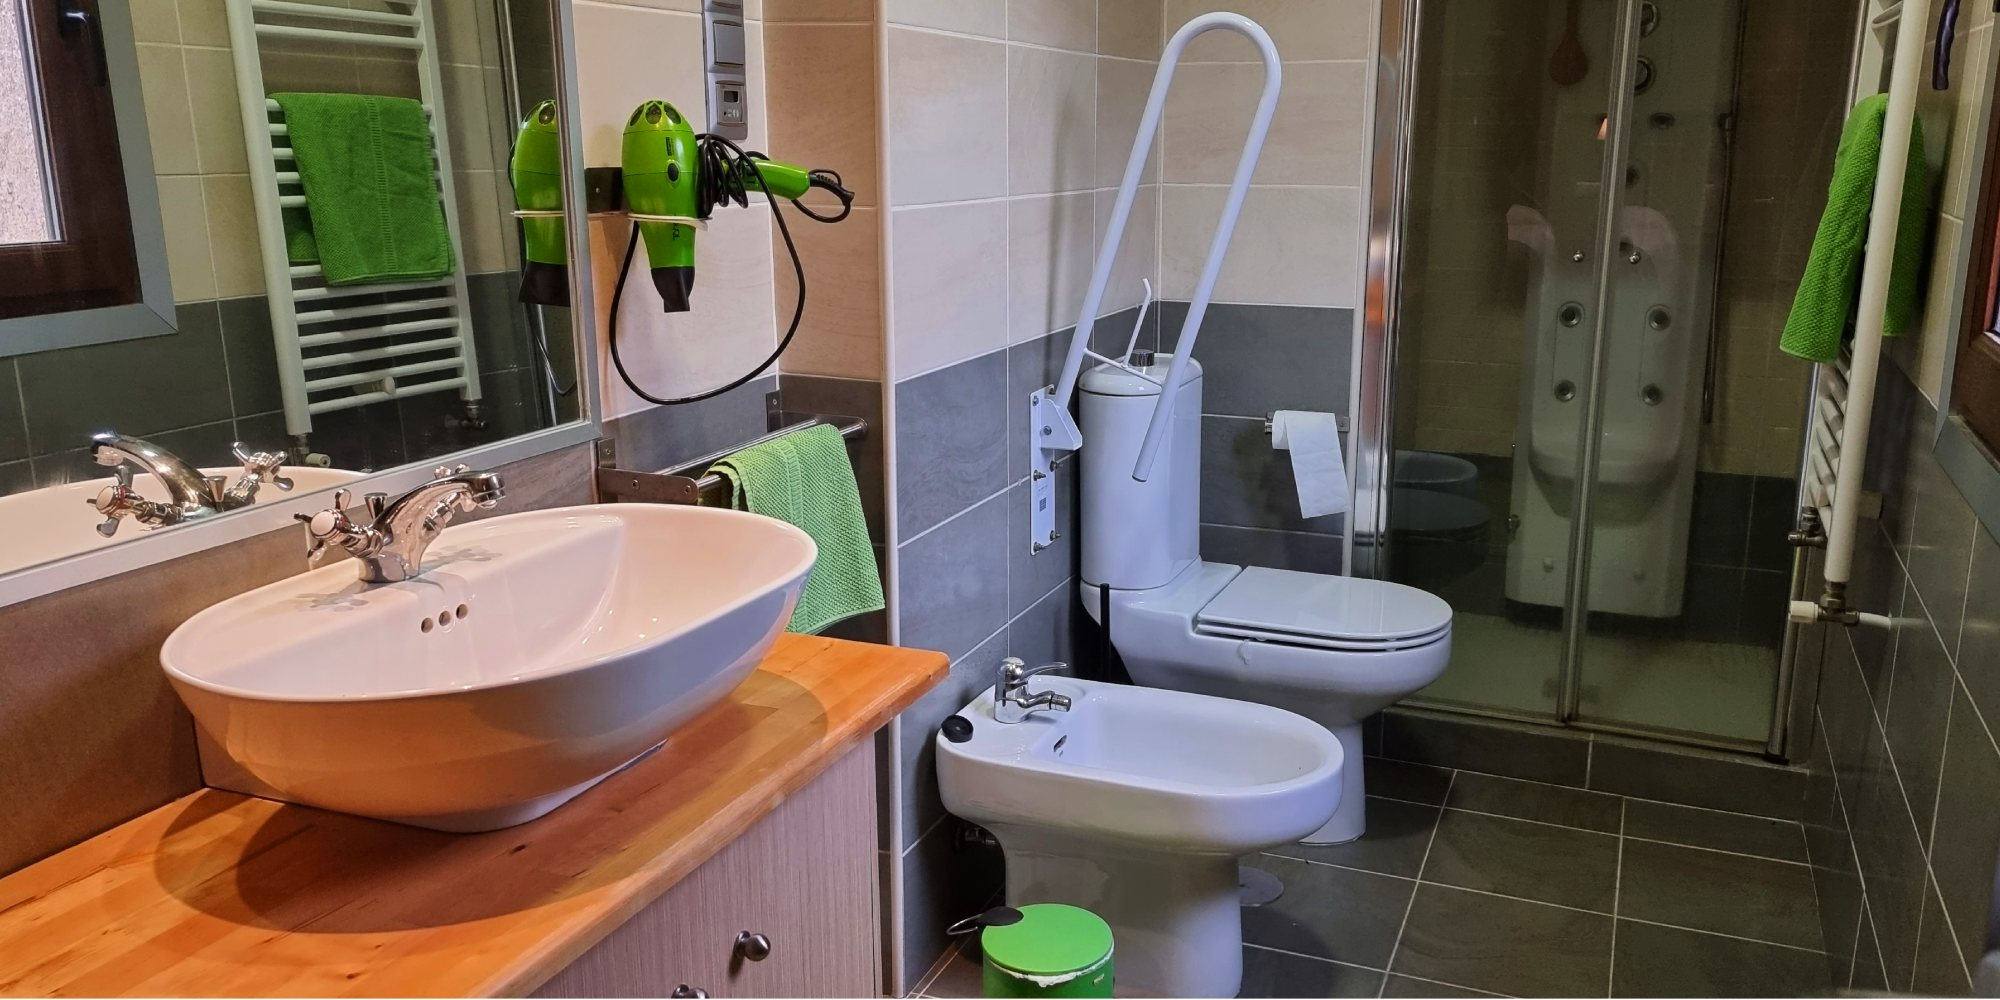 lavabo-baño-ducha-casaomillon